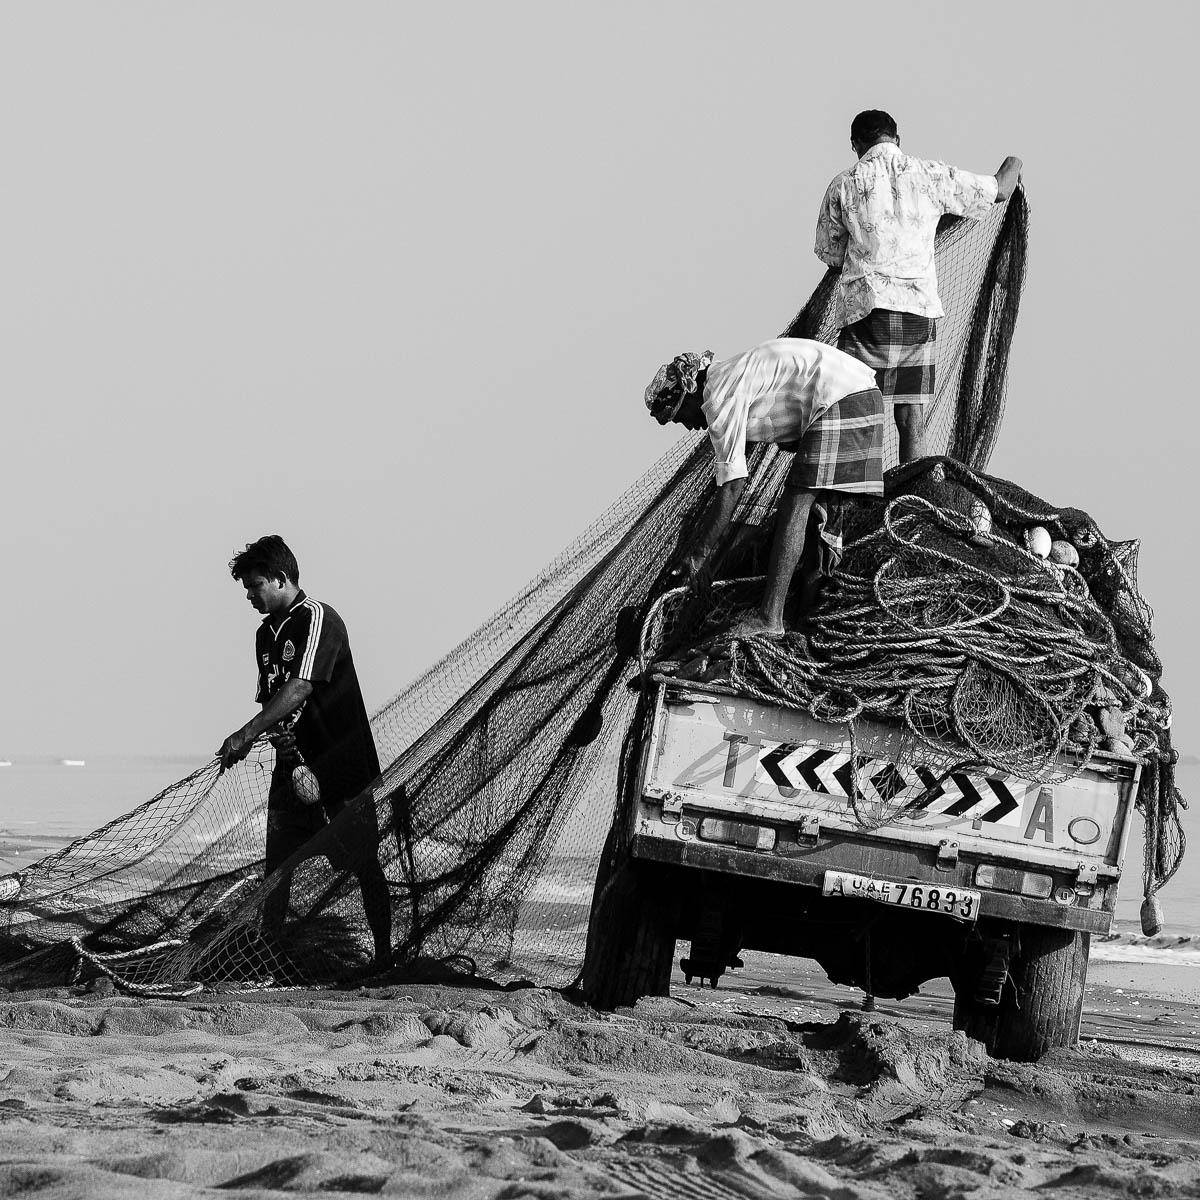 Fishermen prepare the nets at the beginning of the day. Khor Kalba, Sharjah, UAE